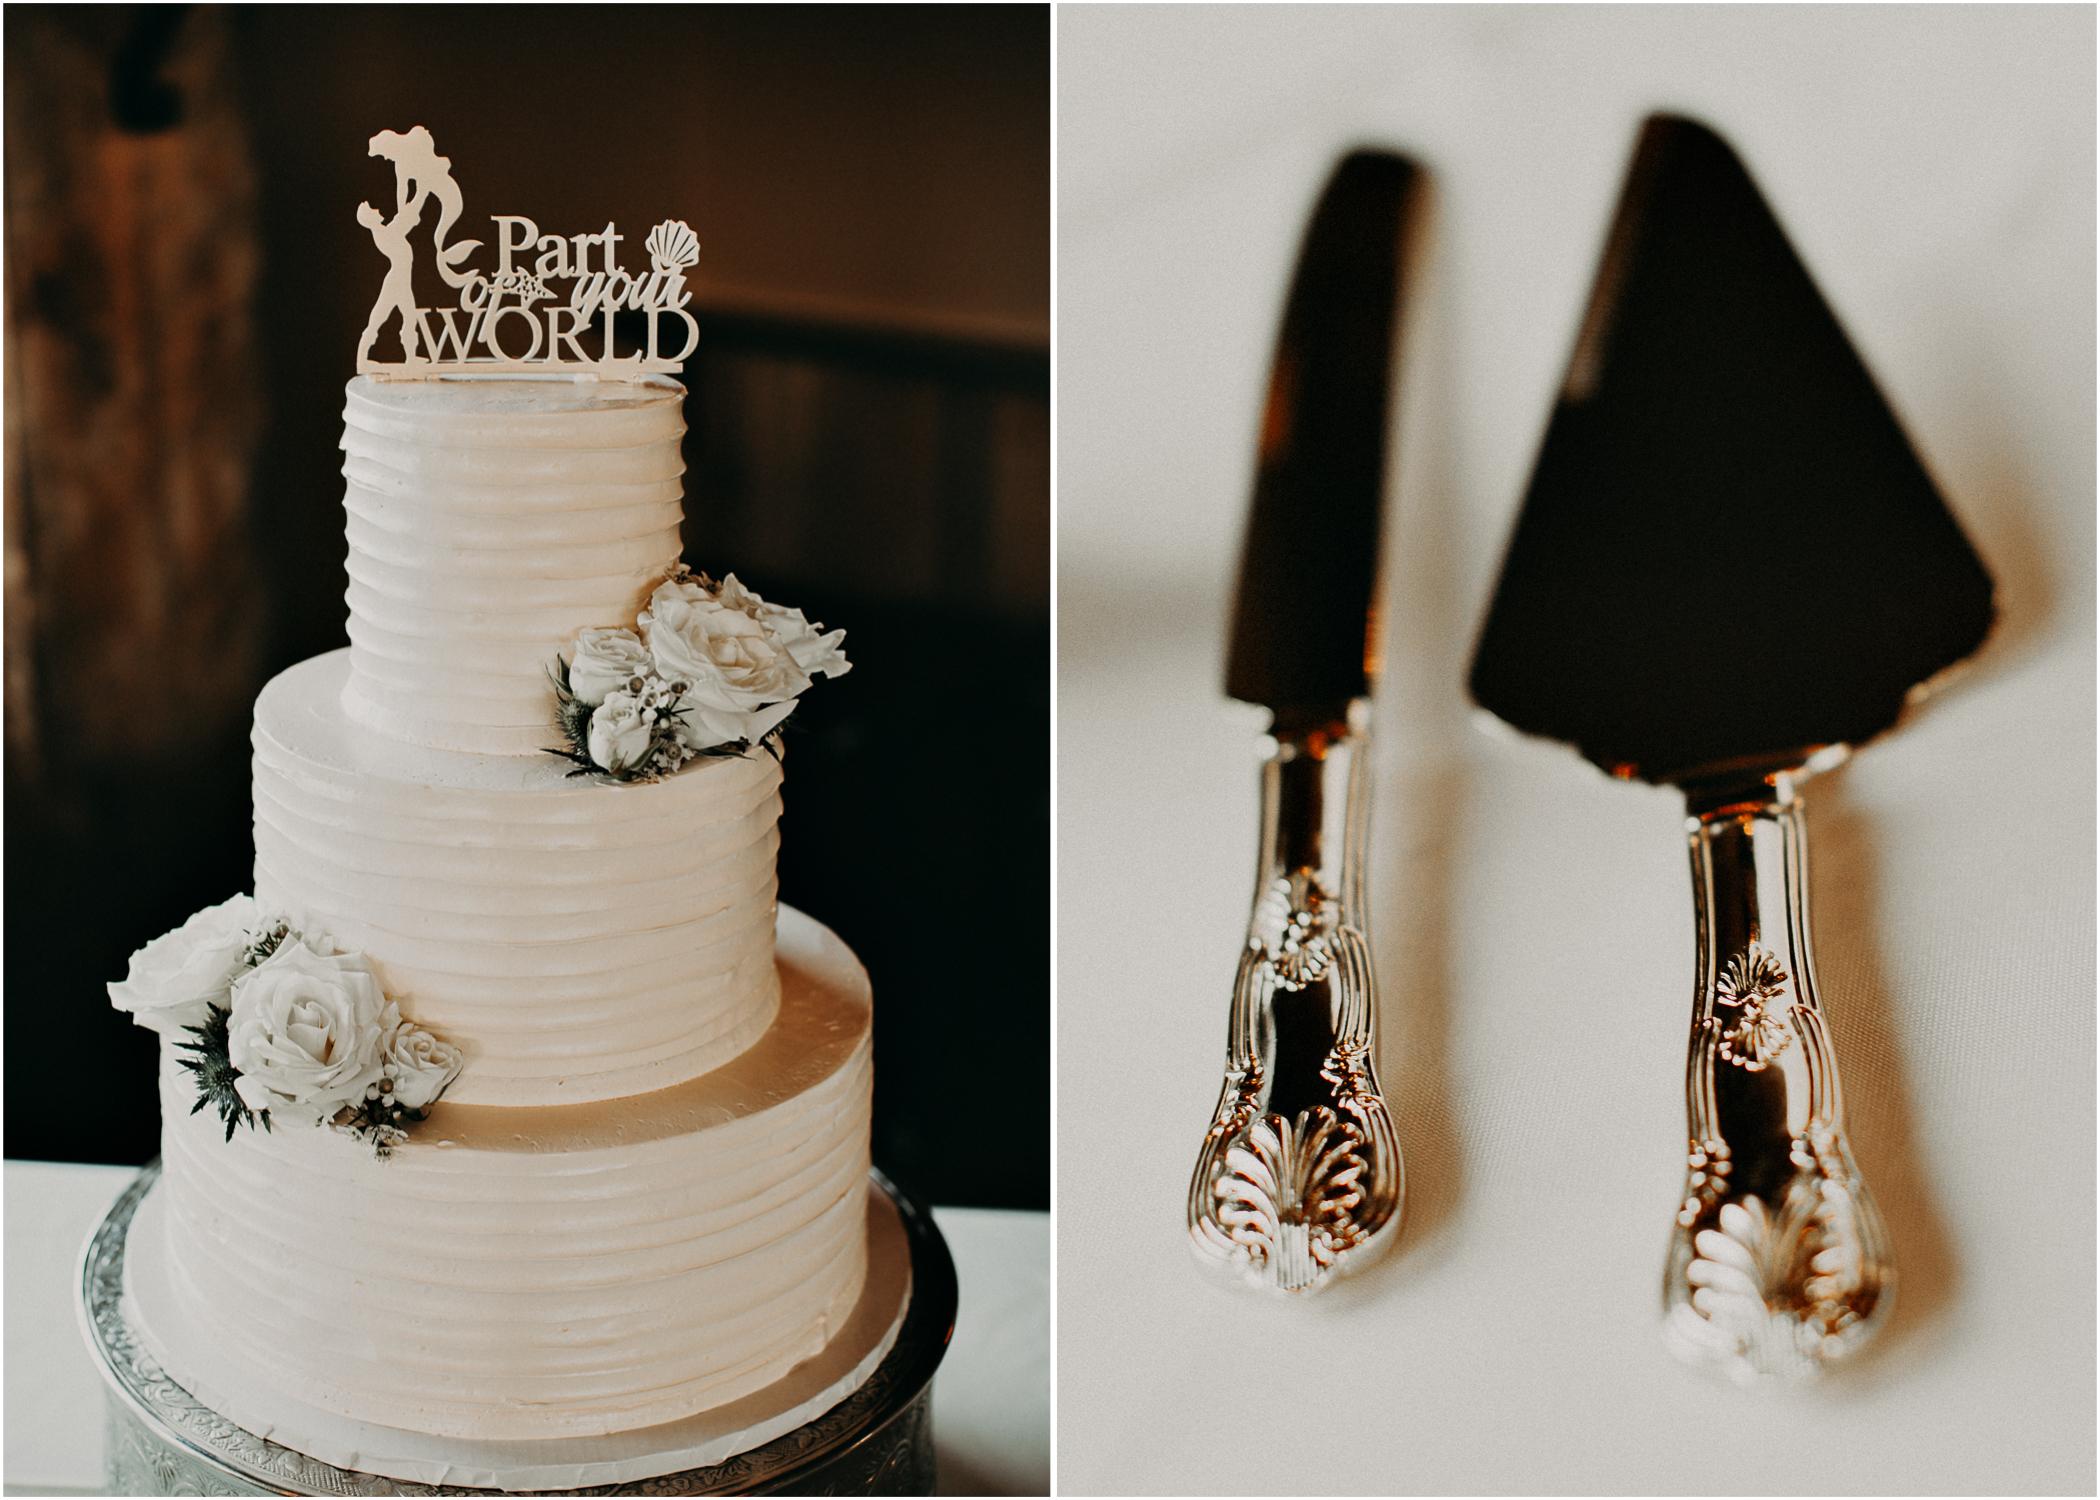 65- Kaya_vineyard_dahlonega_wedding_venue_cake_aline_marin_photography.jpg